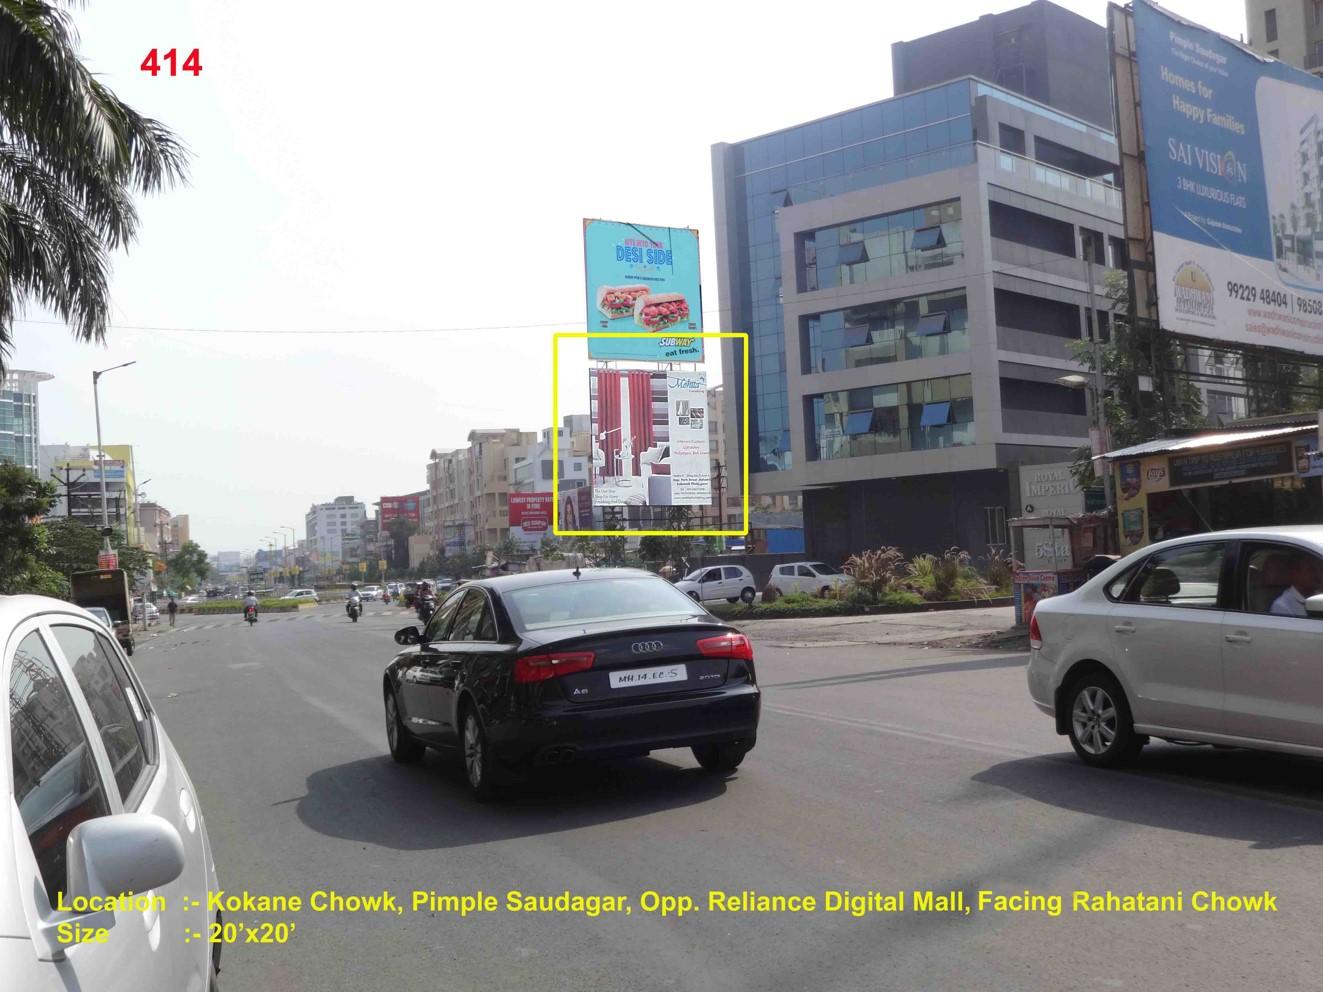 Kokane Chowk, Pimple Saudagar, Opp. Reliance Digital Mall, Pune